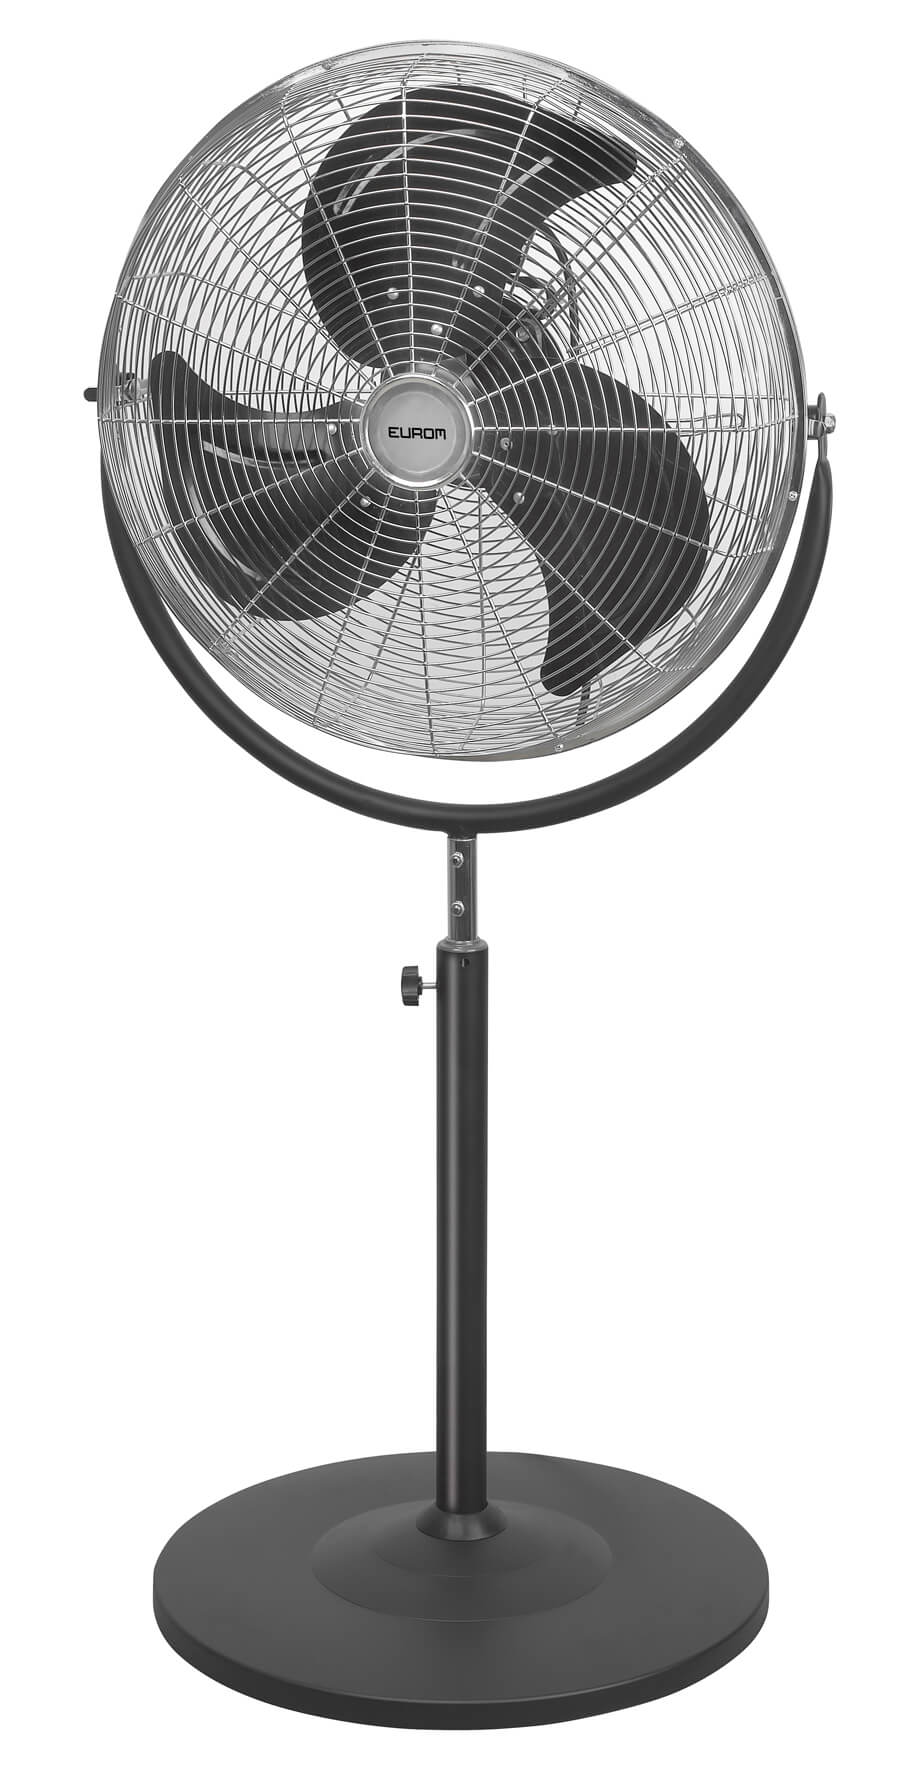 Eurom HVF18S-2 Staand model ventilator 46 cm professioneel vloermodel